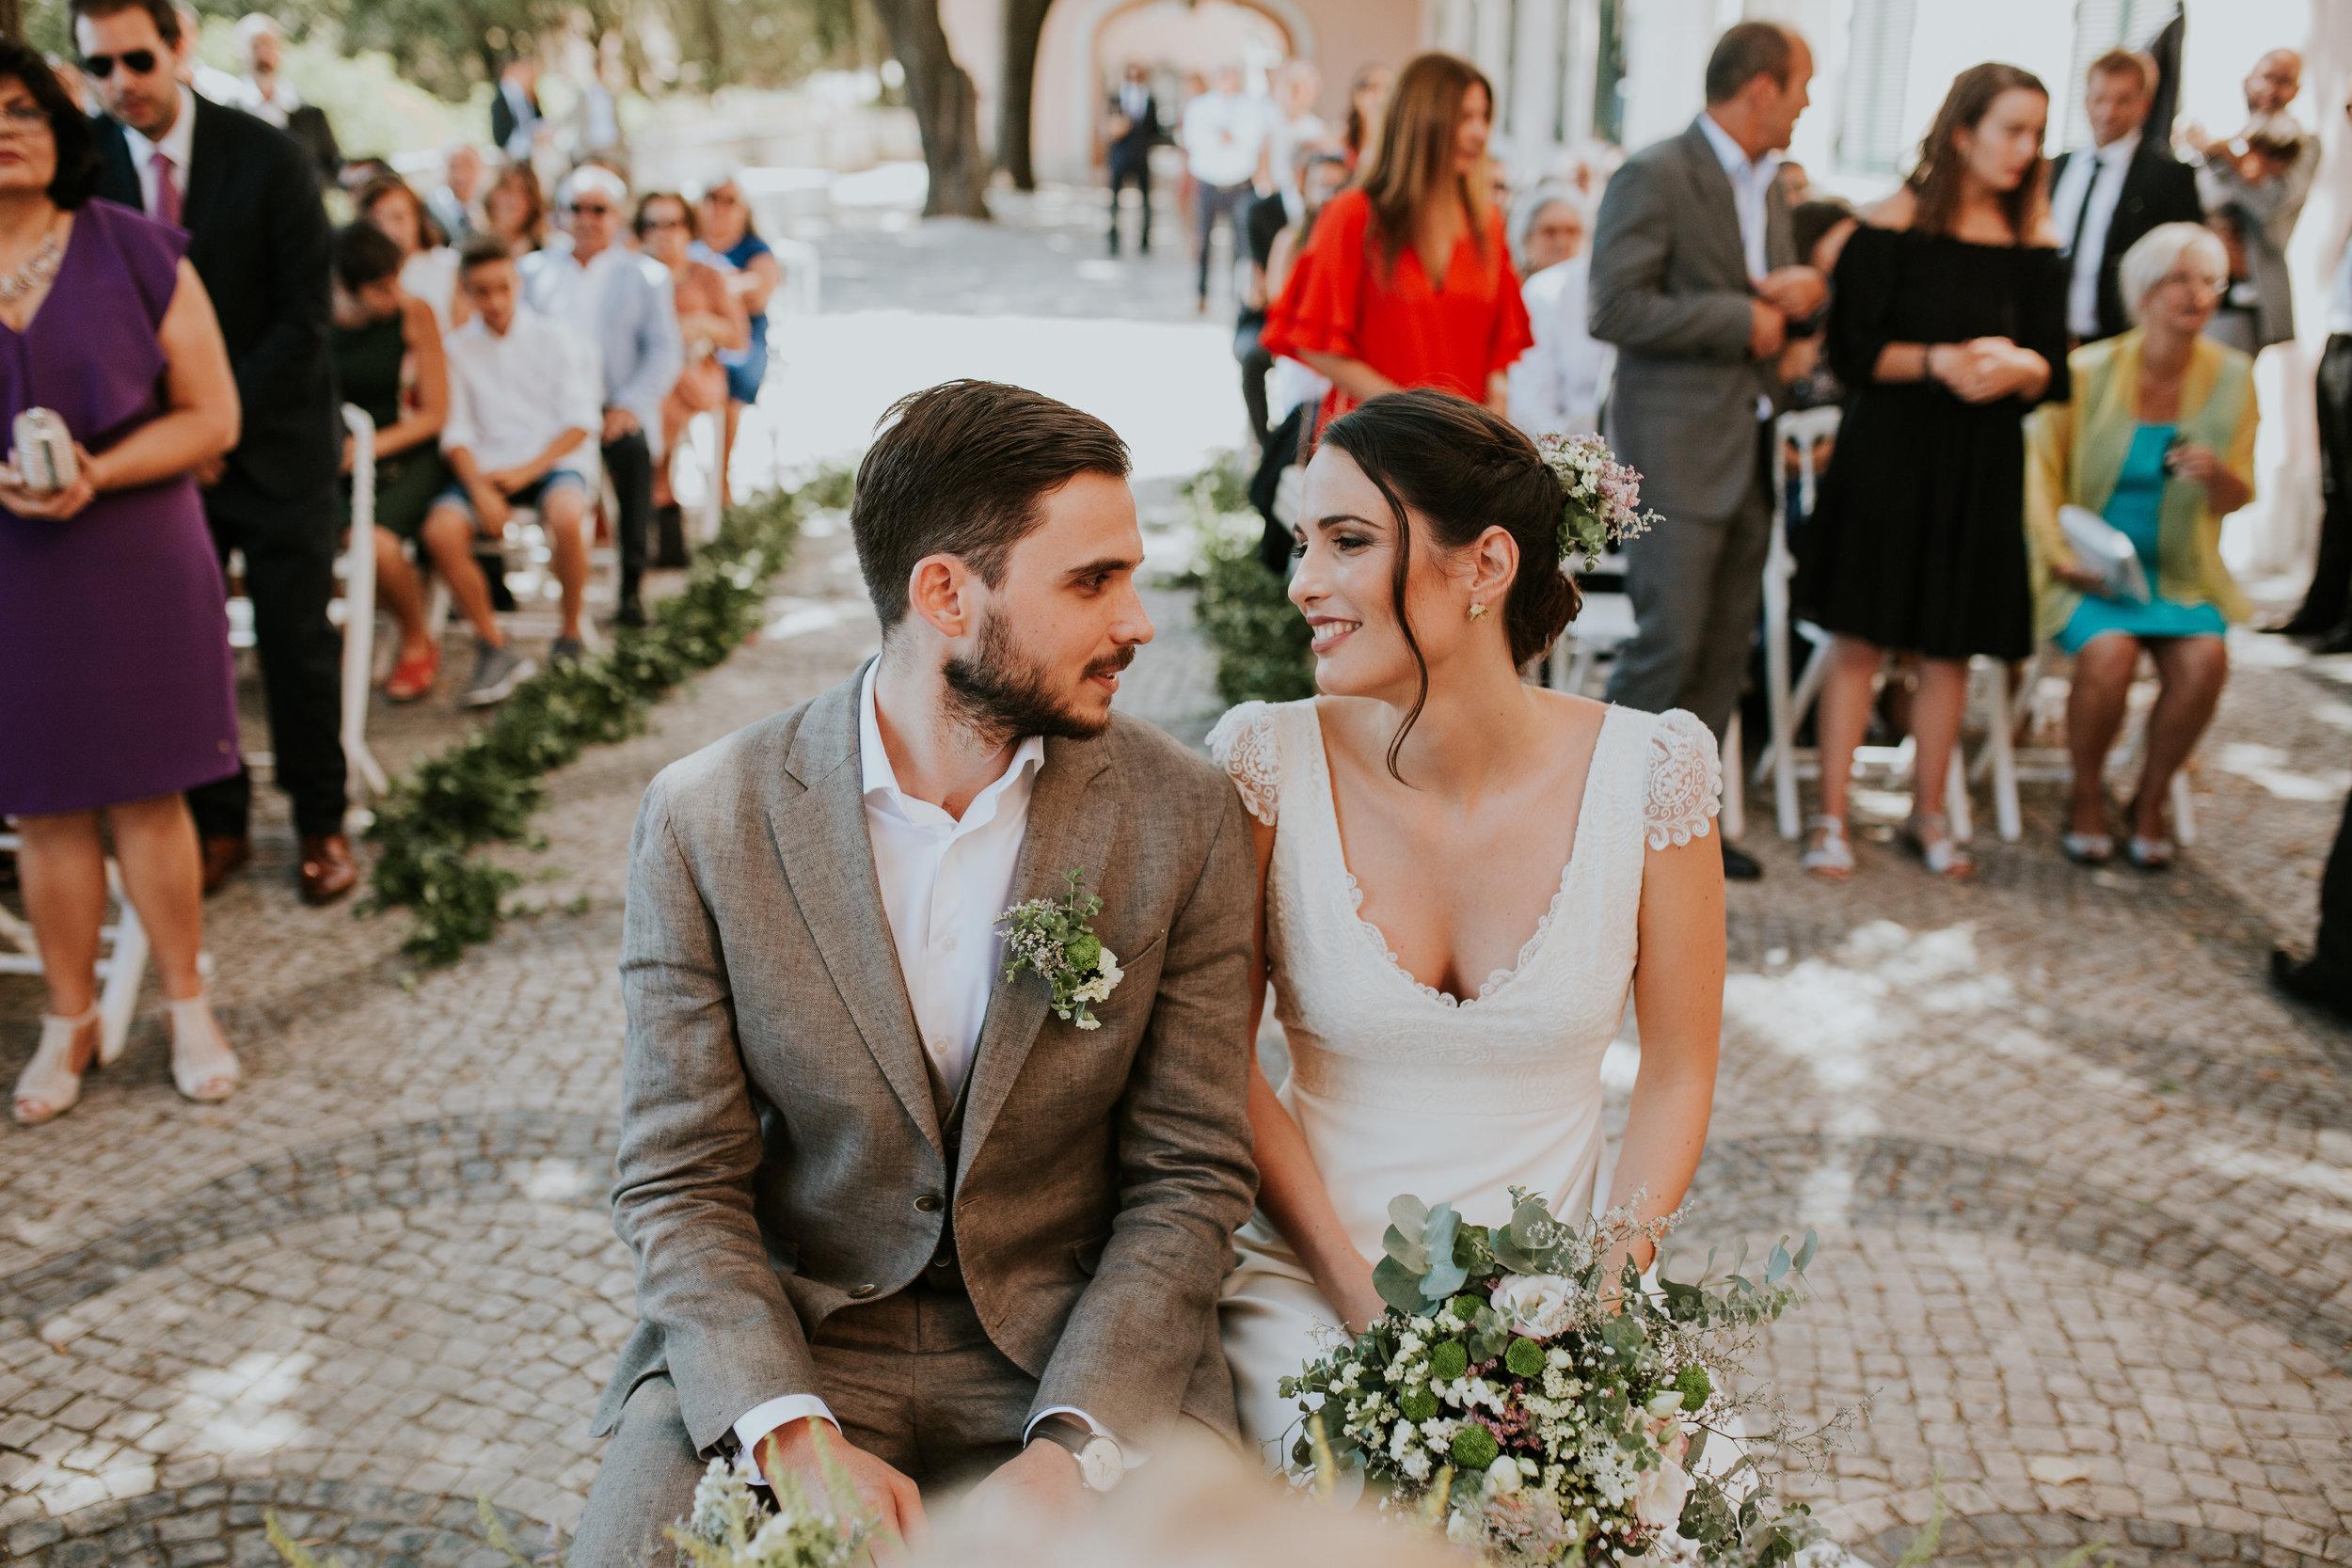 J&P 222_ 02 setembro 2017 Wedding day_.jpg